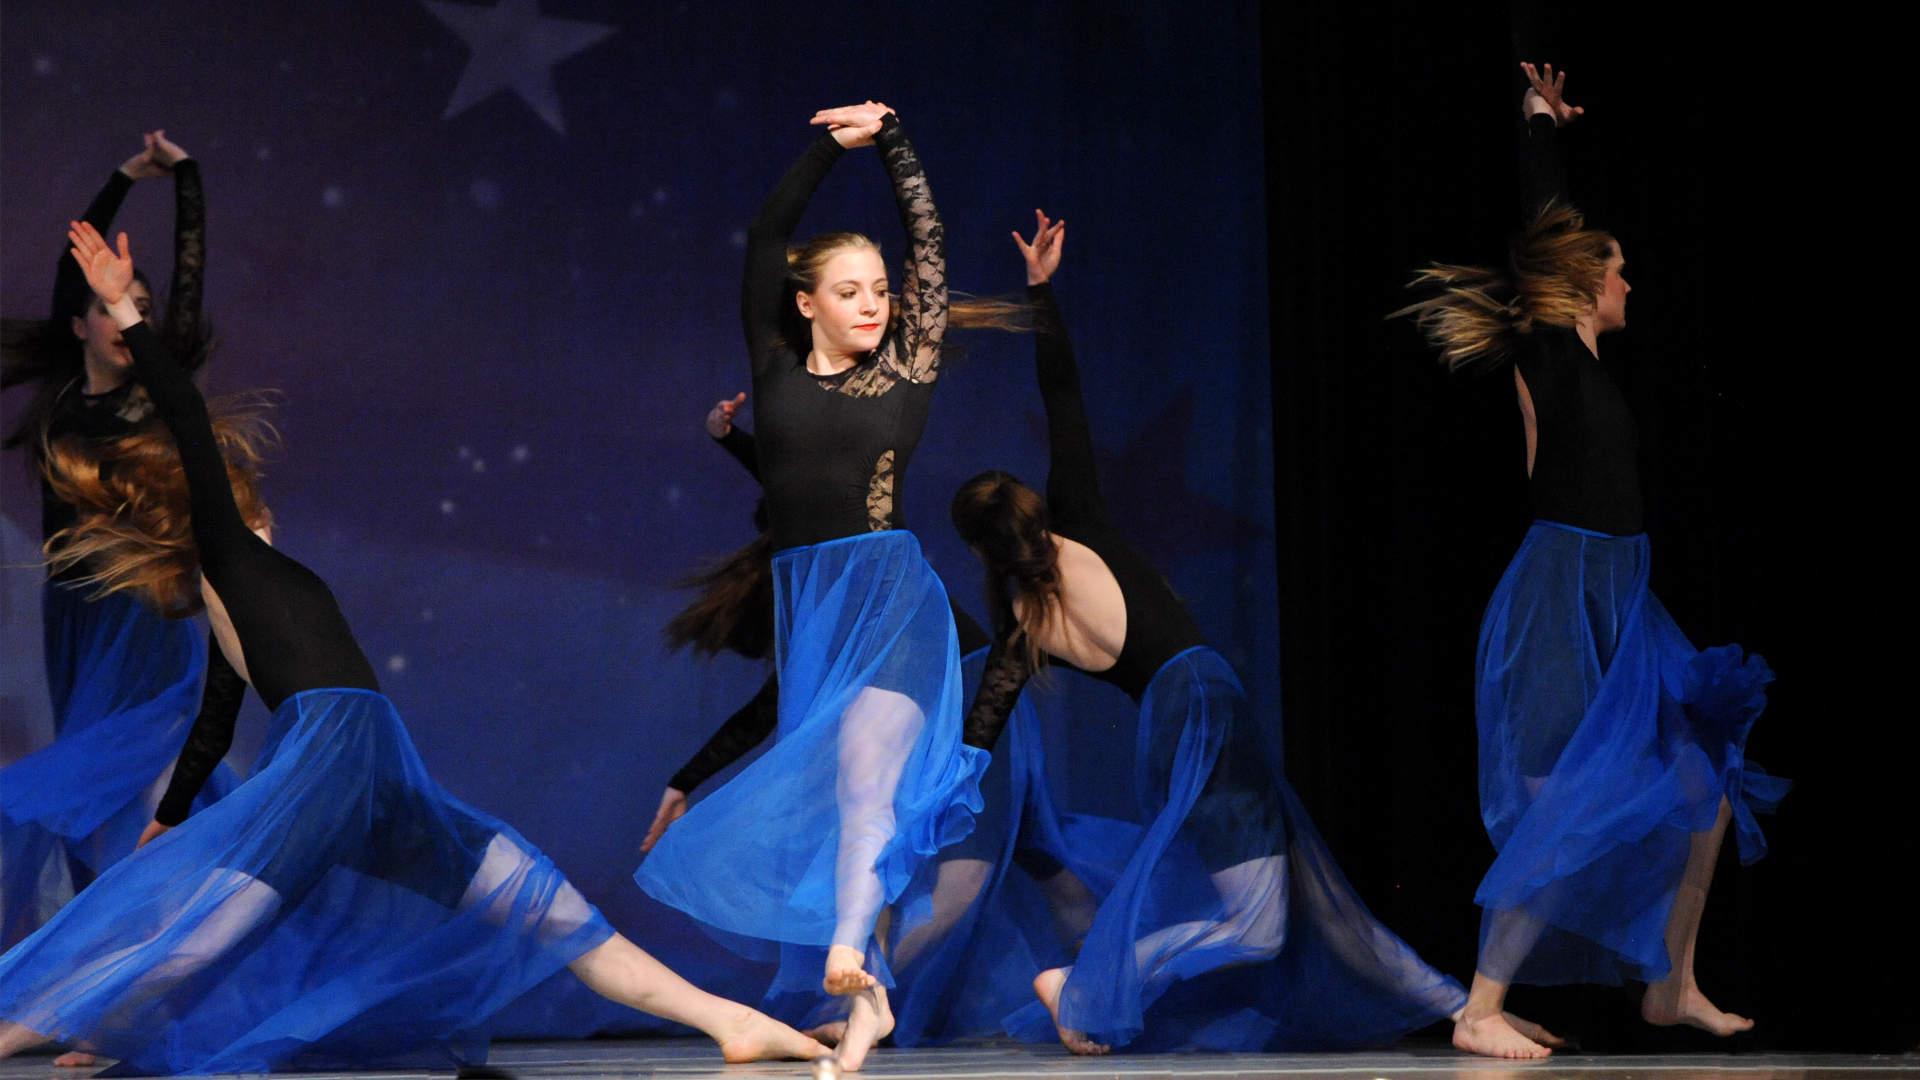 Girls performing arts